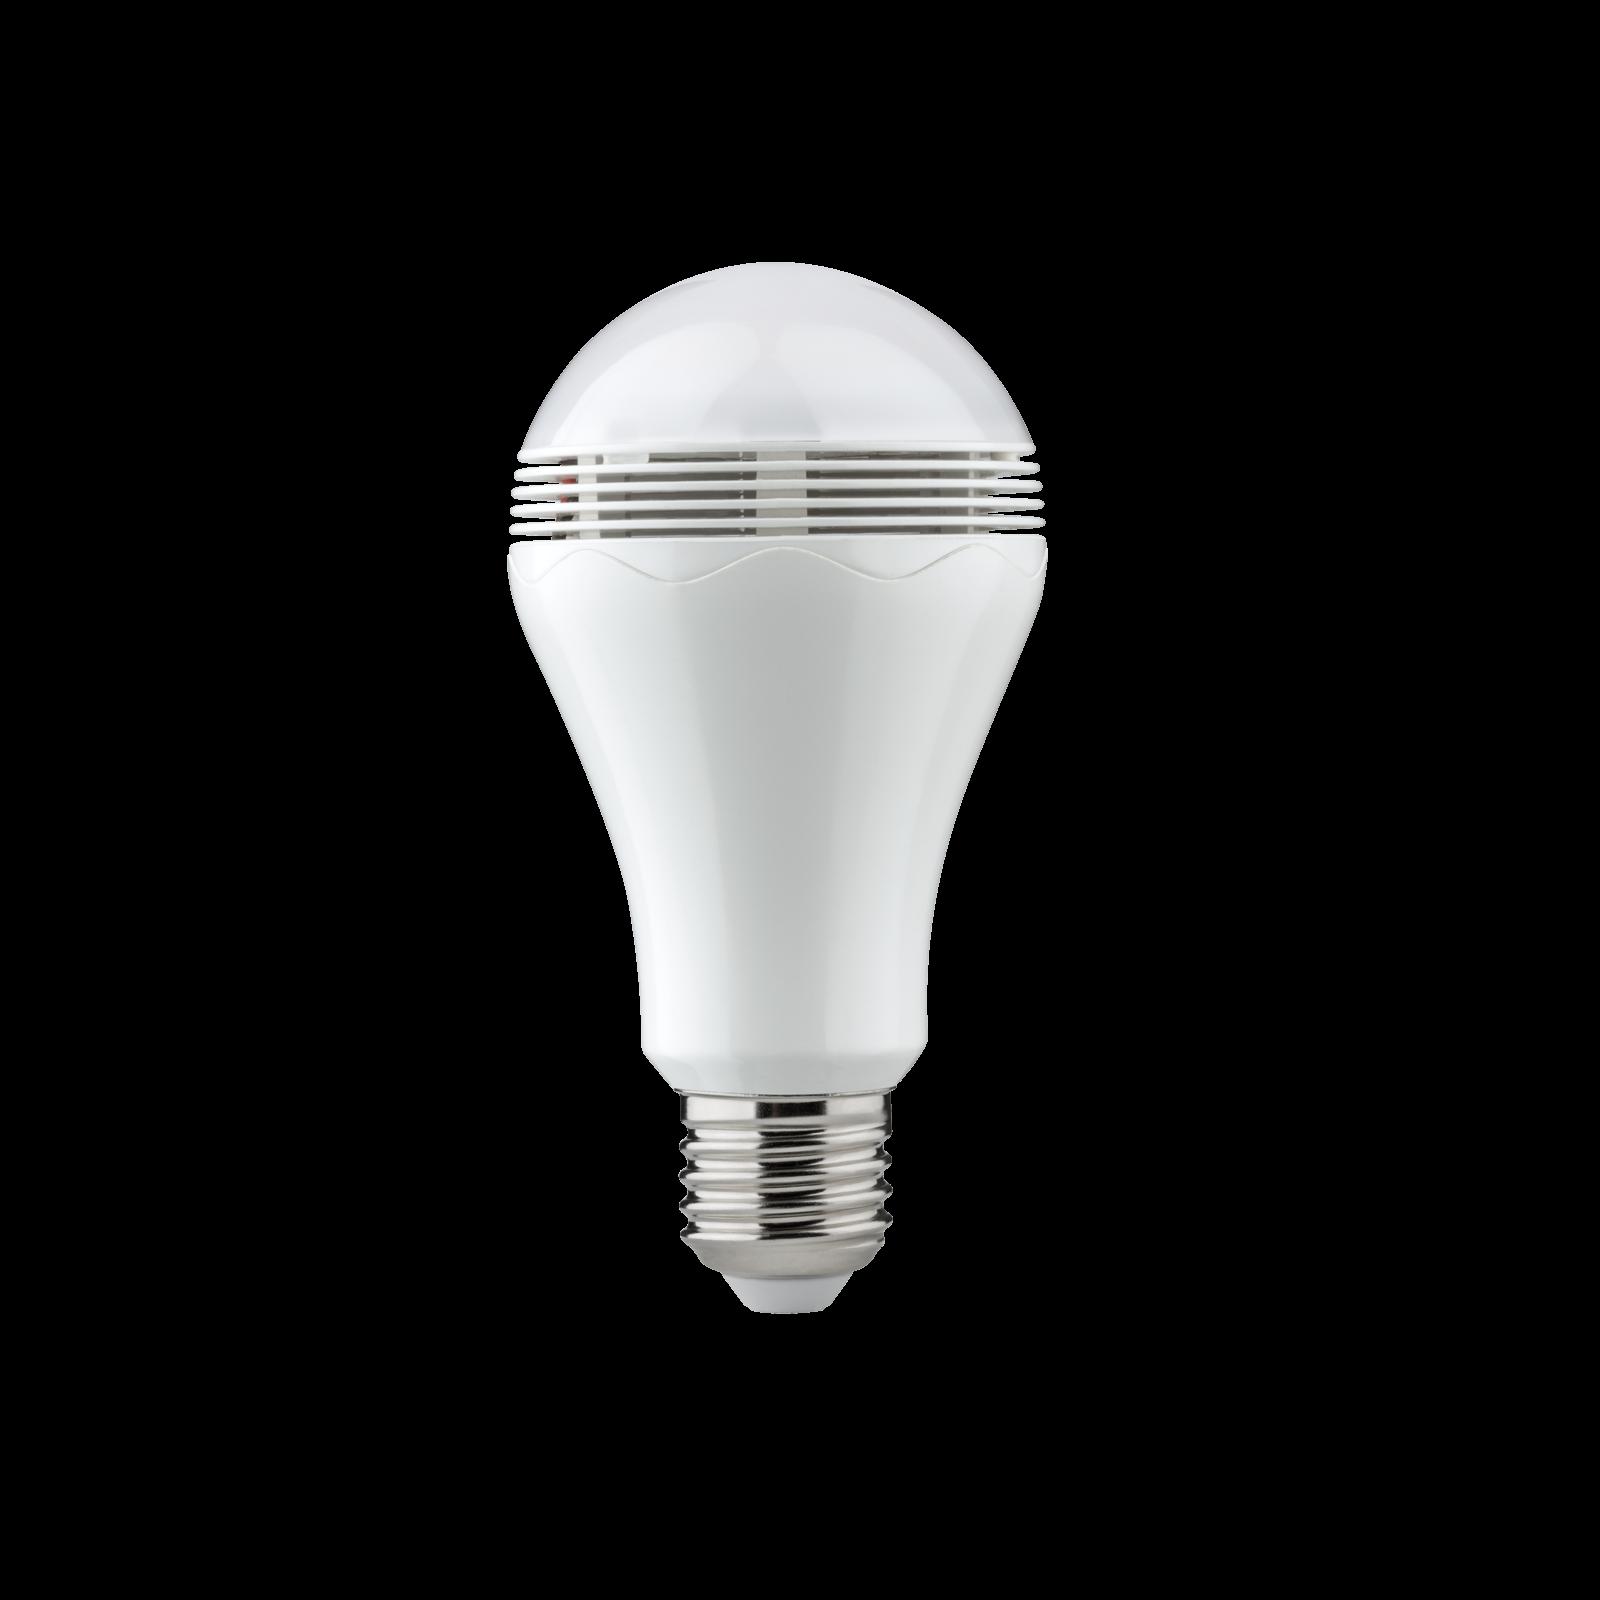 Paulmann LED-Lampe mit integriertem Bluetooth-Lautsprecher